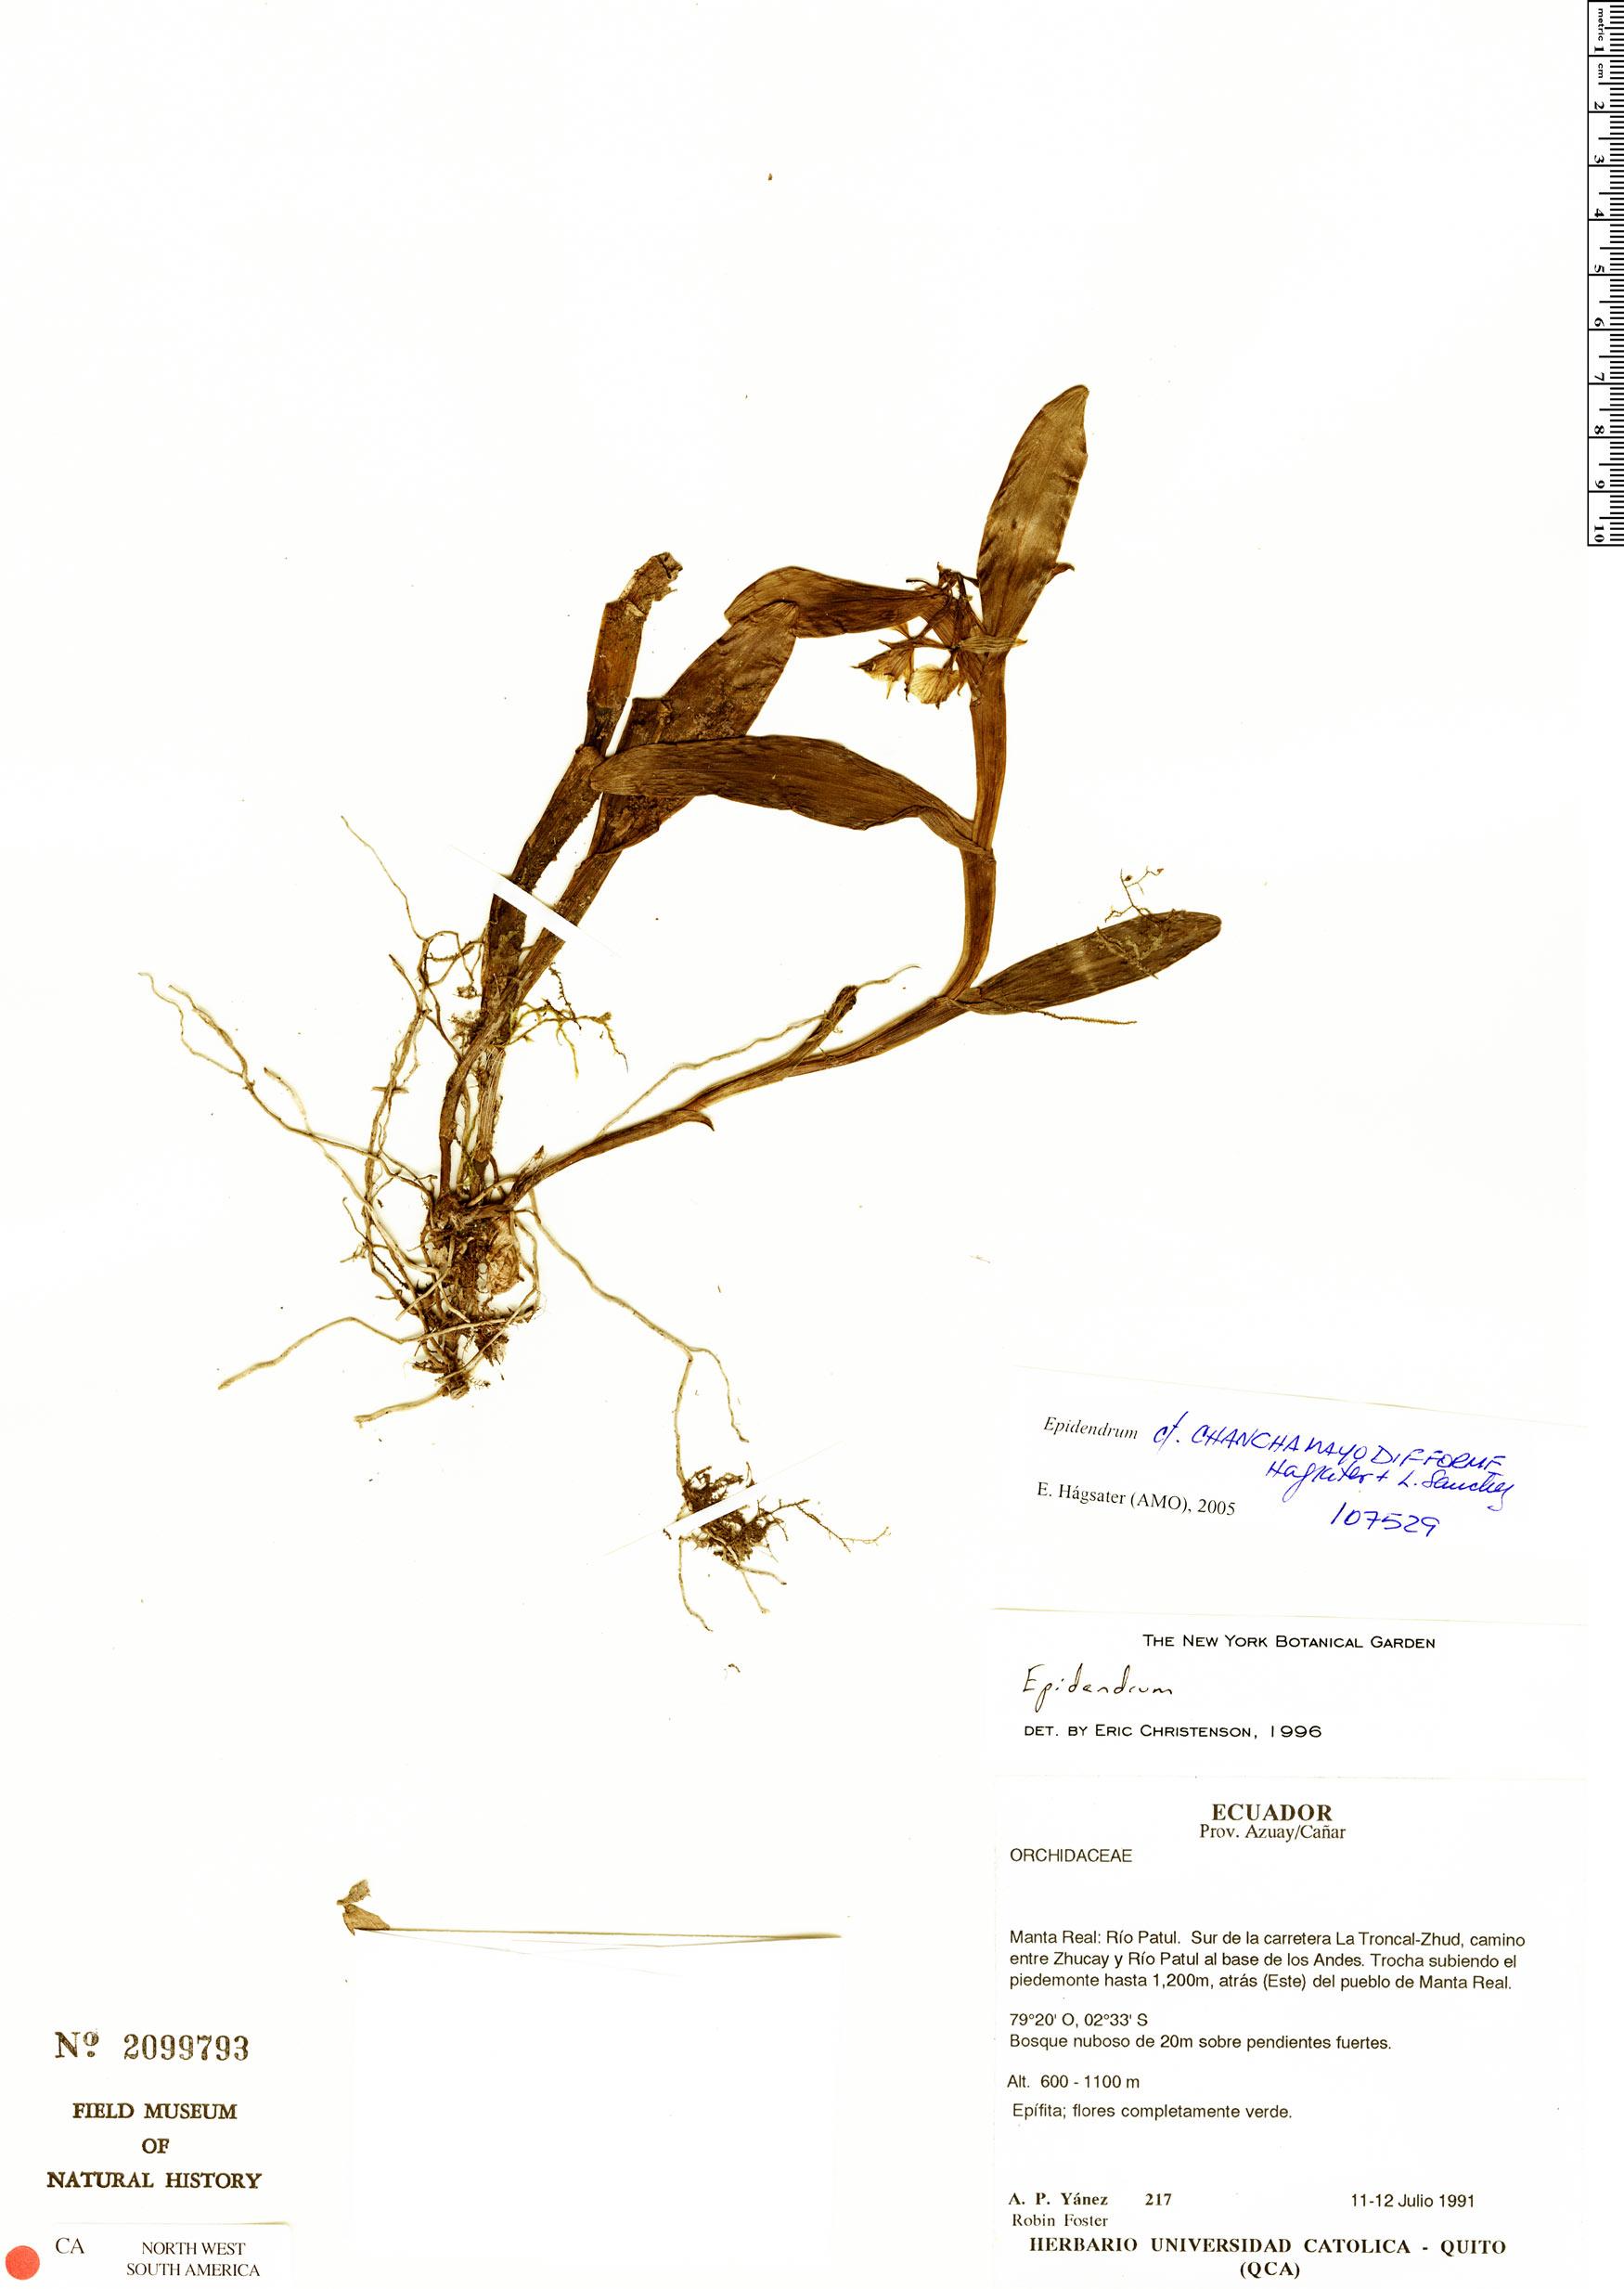 Specimen: Epidendrum chanchamayodifforme